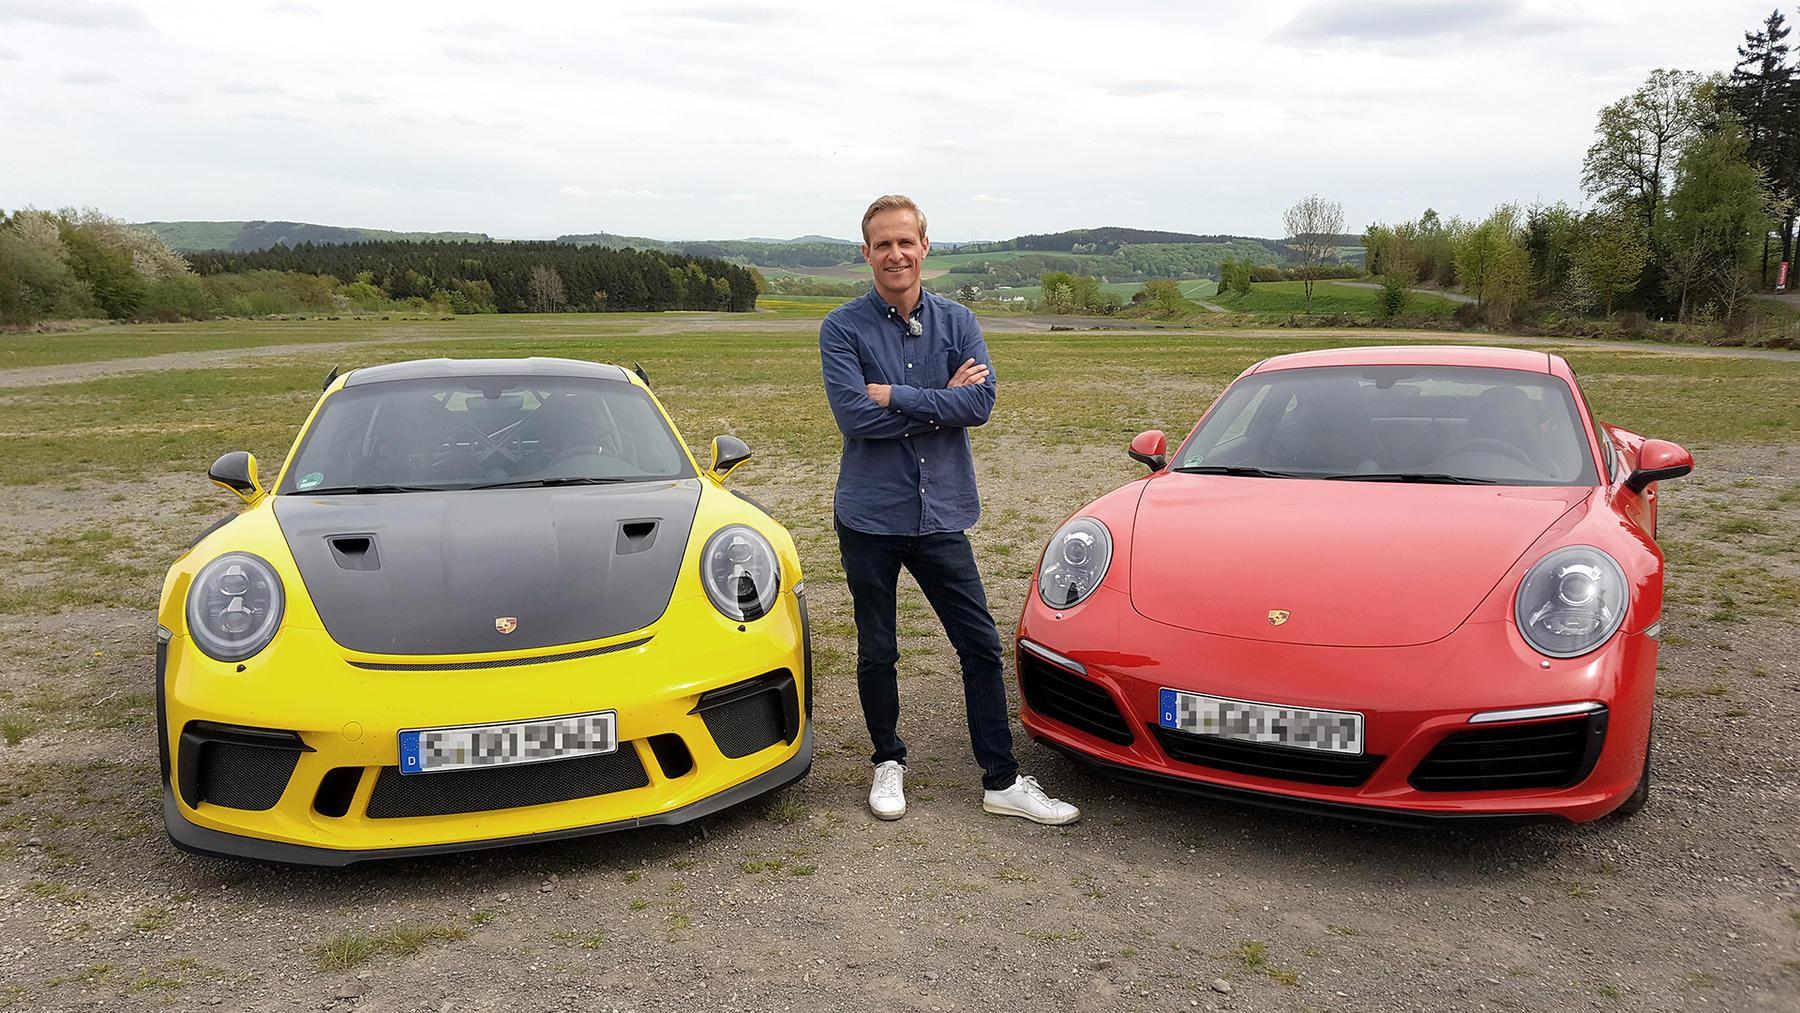 Det sucht Auto für Sabine | Autoversteigerung Chemnitz | Test Rückfahrkamera | VW Touareg vs. Volvo XC90 | 24h Le Mans | Porsche GT3 RS | Folge 448